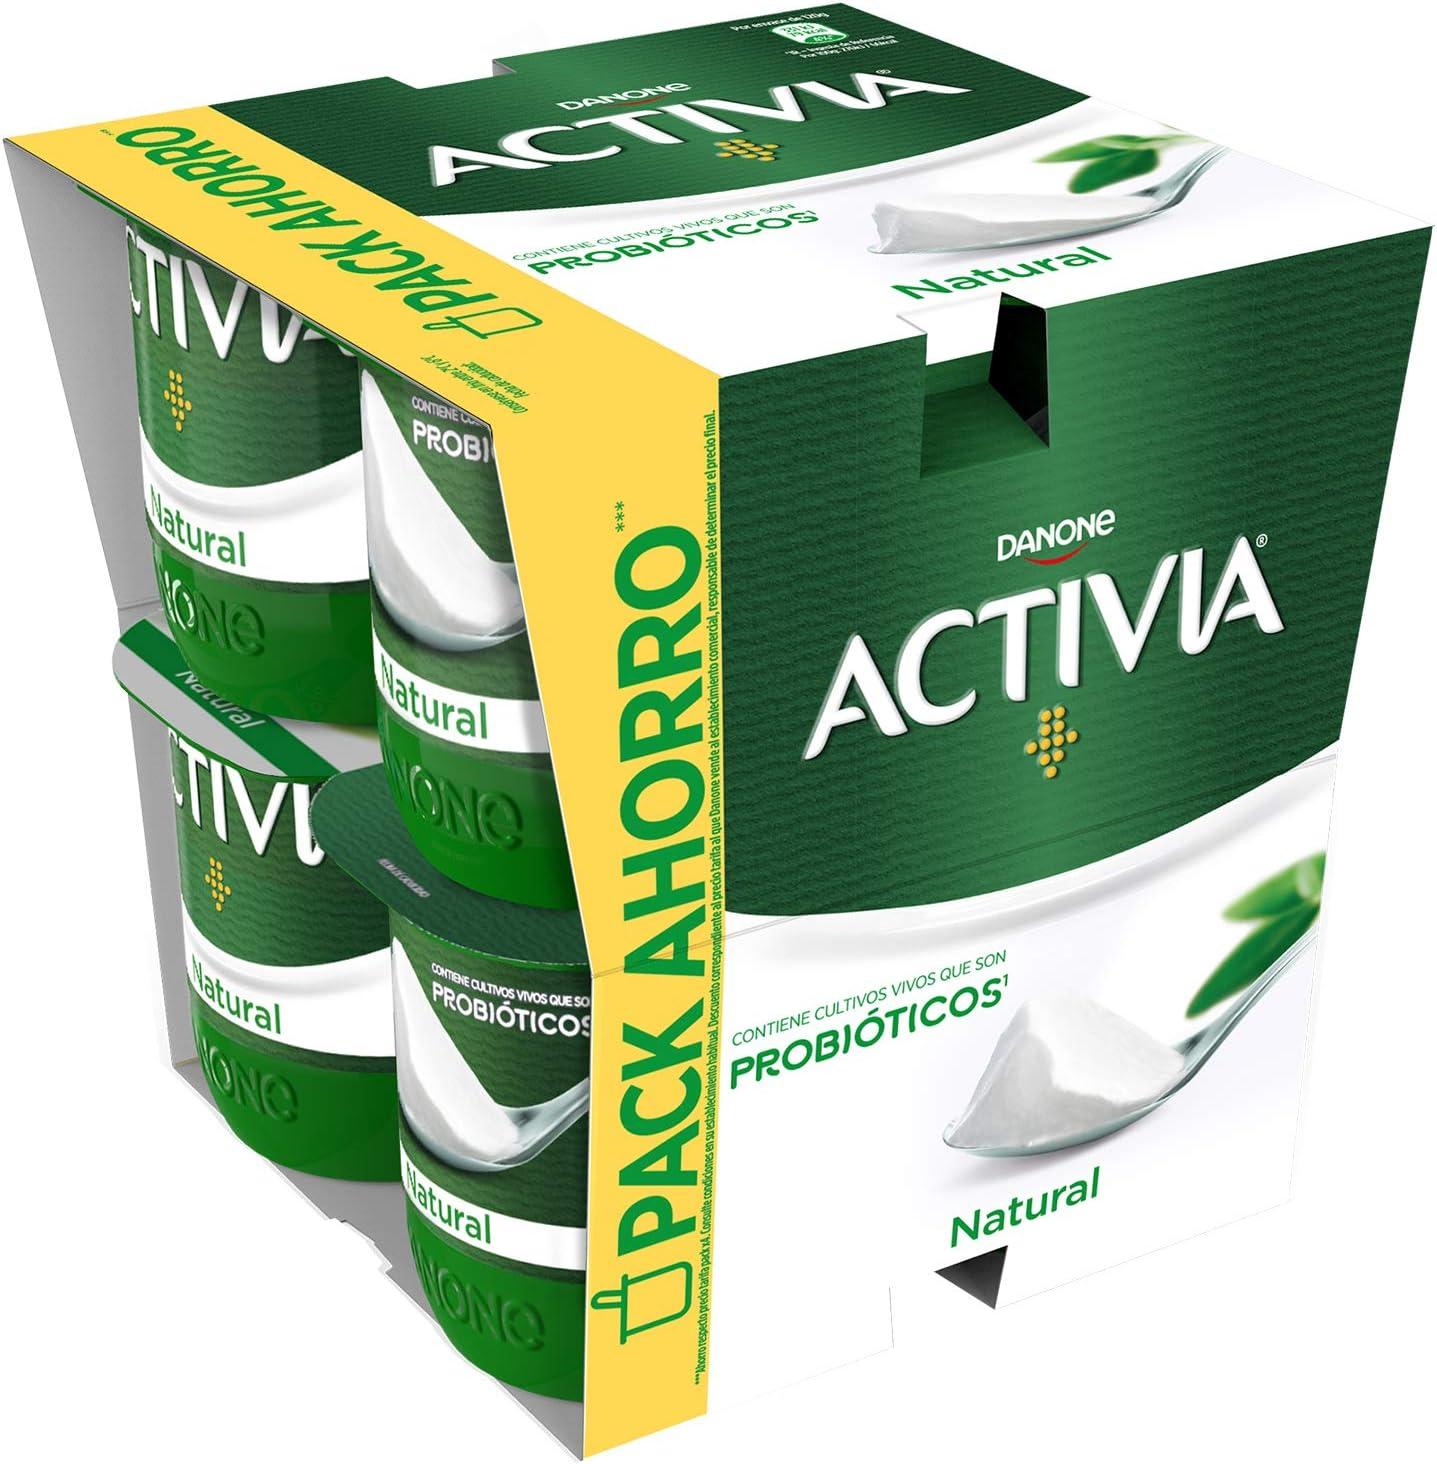 Activia Yogur Natural, 8 x 120g